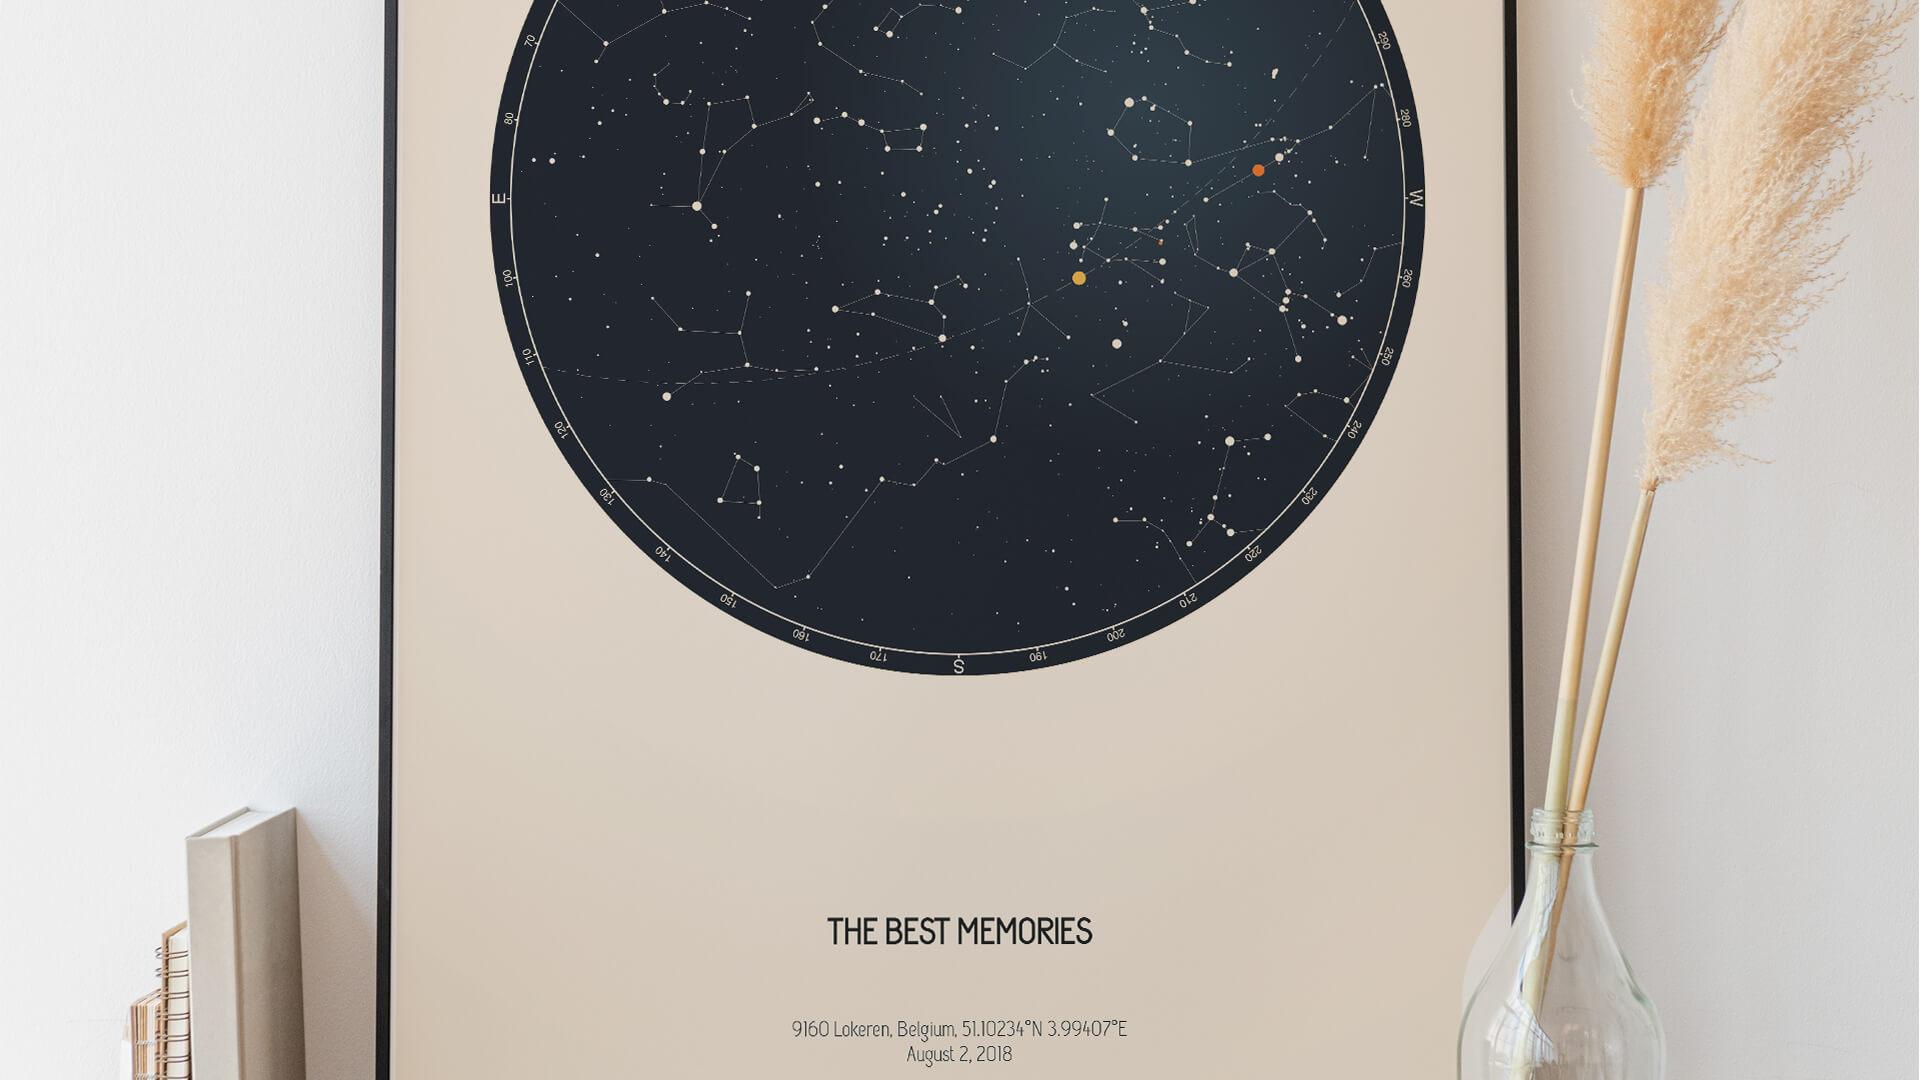 Frases románticas para mapa estelar